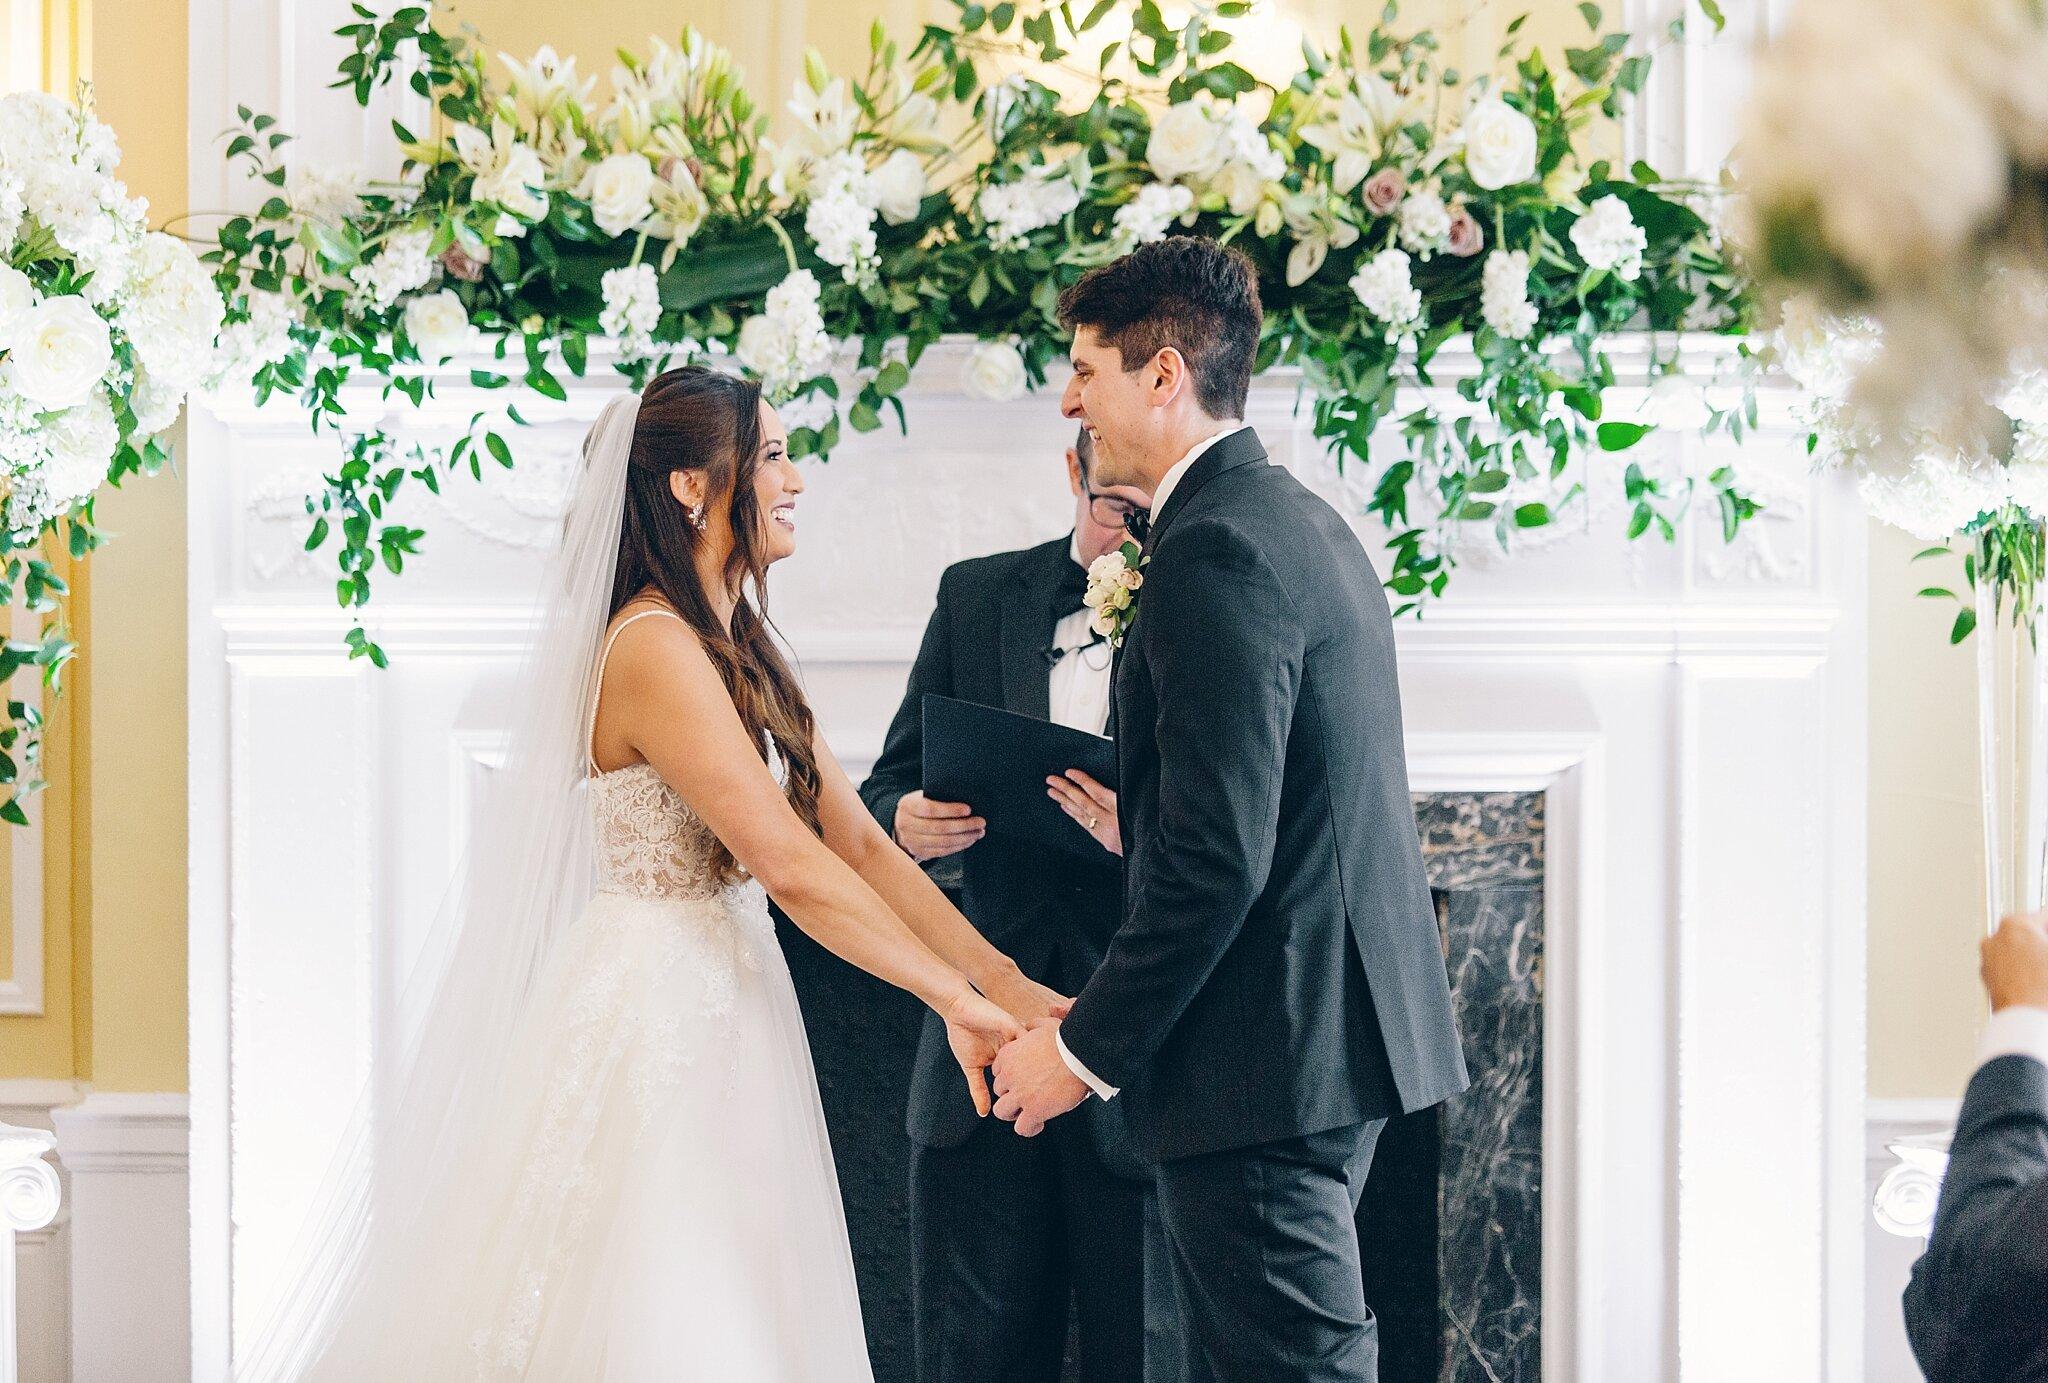 patrick-henry-ballroom-wedding-roanoke_0495.jpg